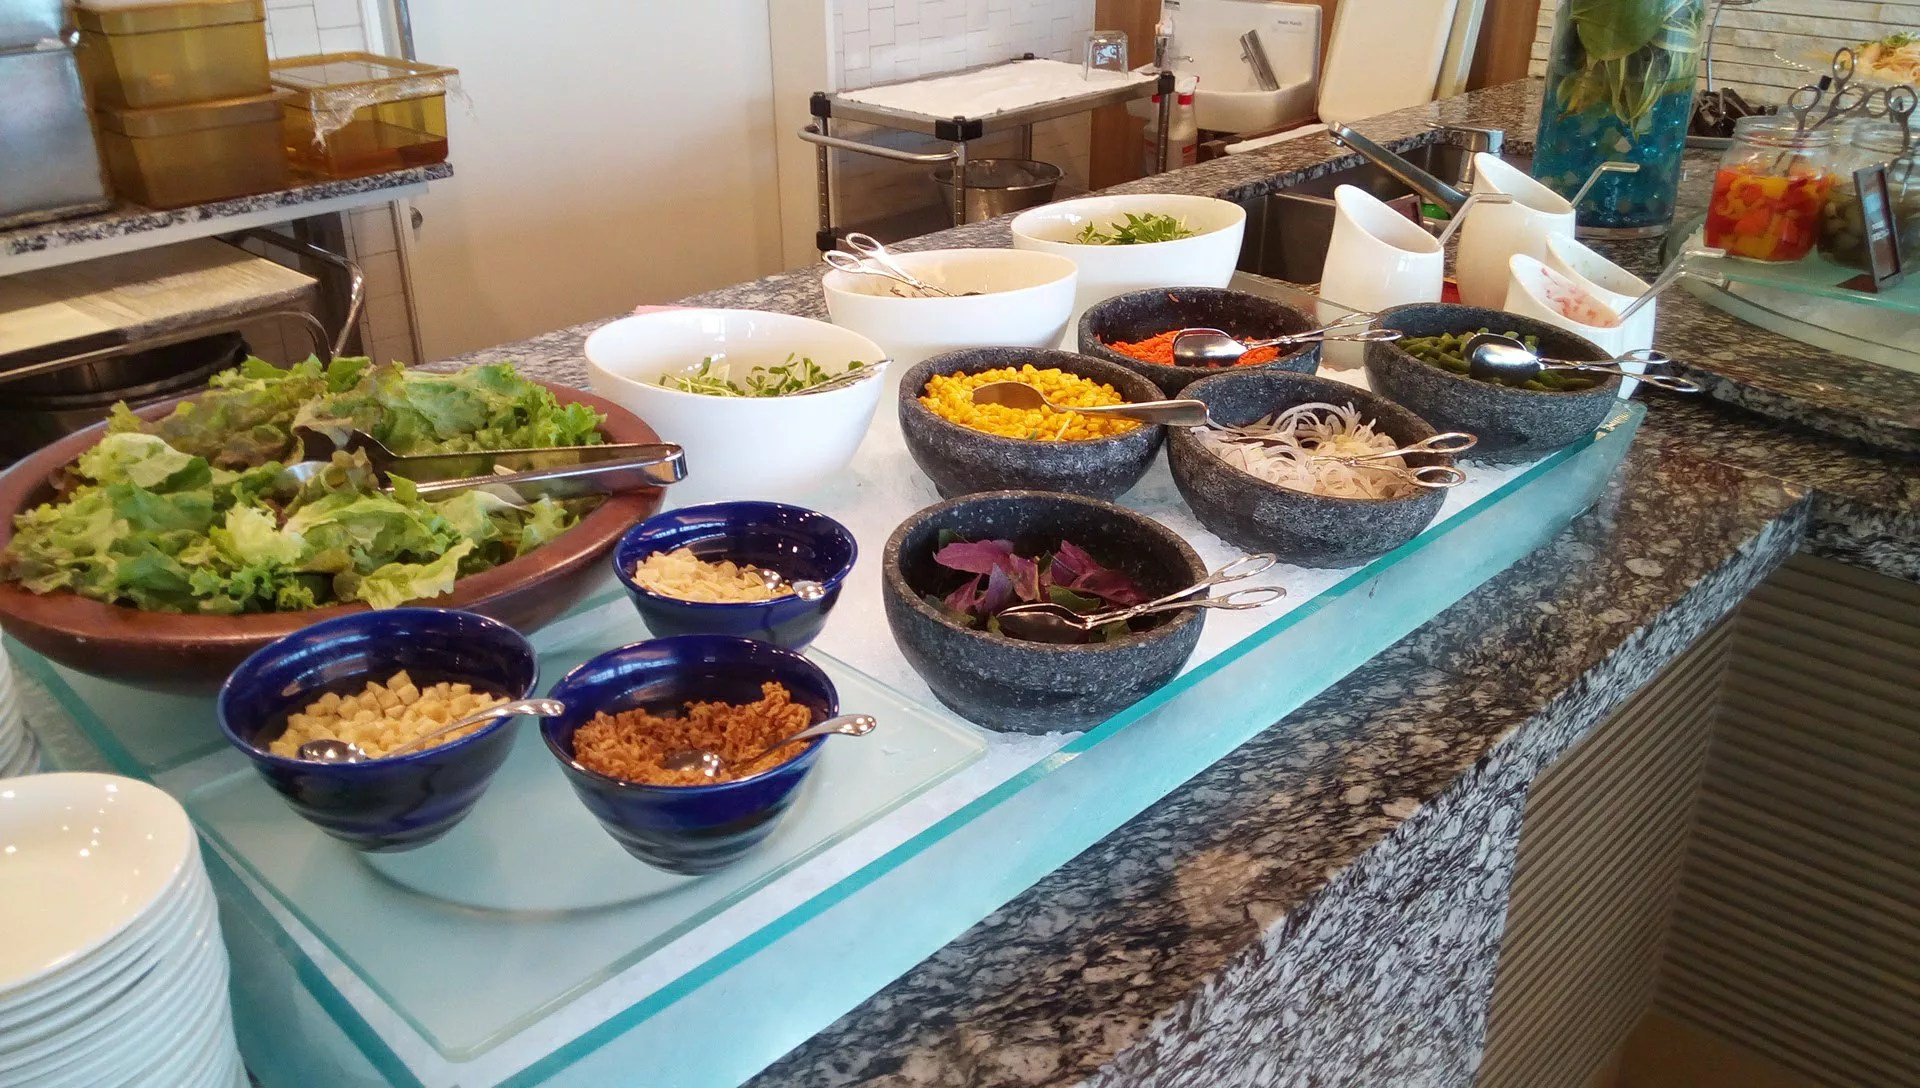 SURIYUNでの食べ放題のサラダ